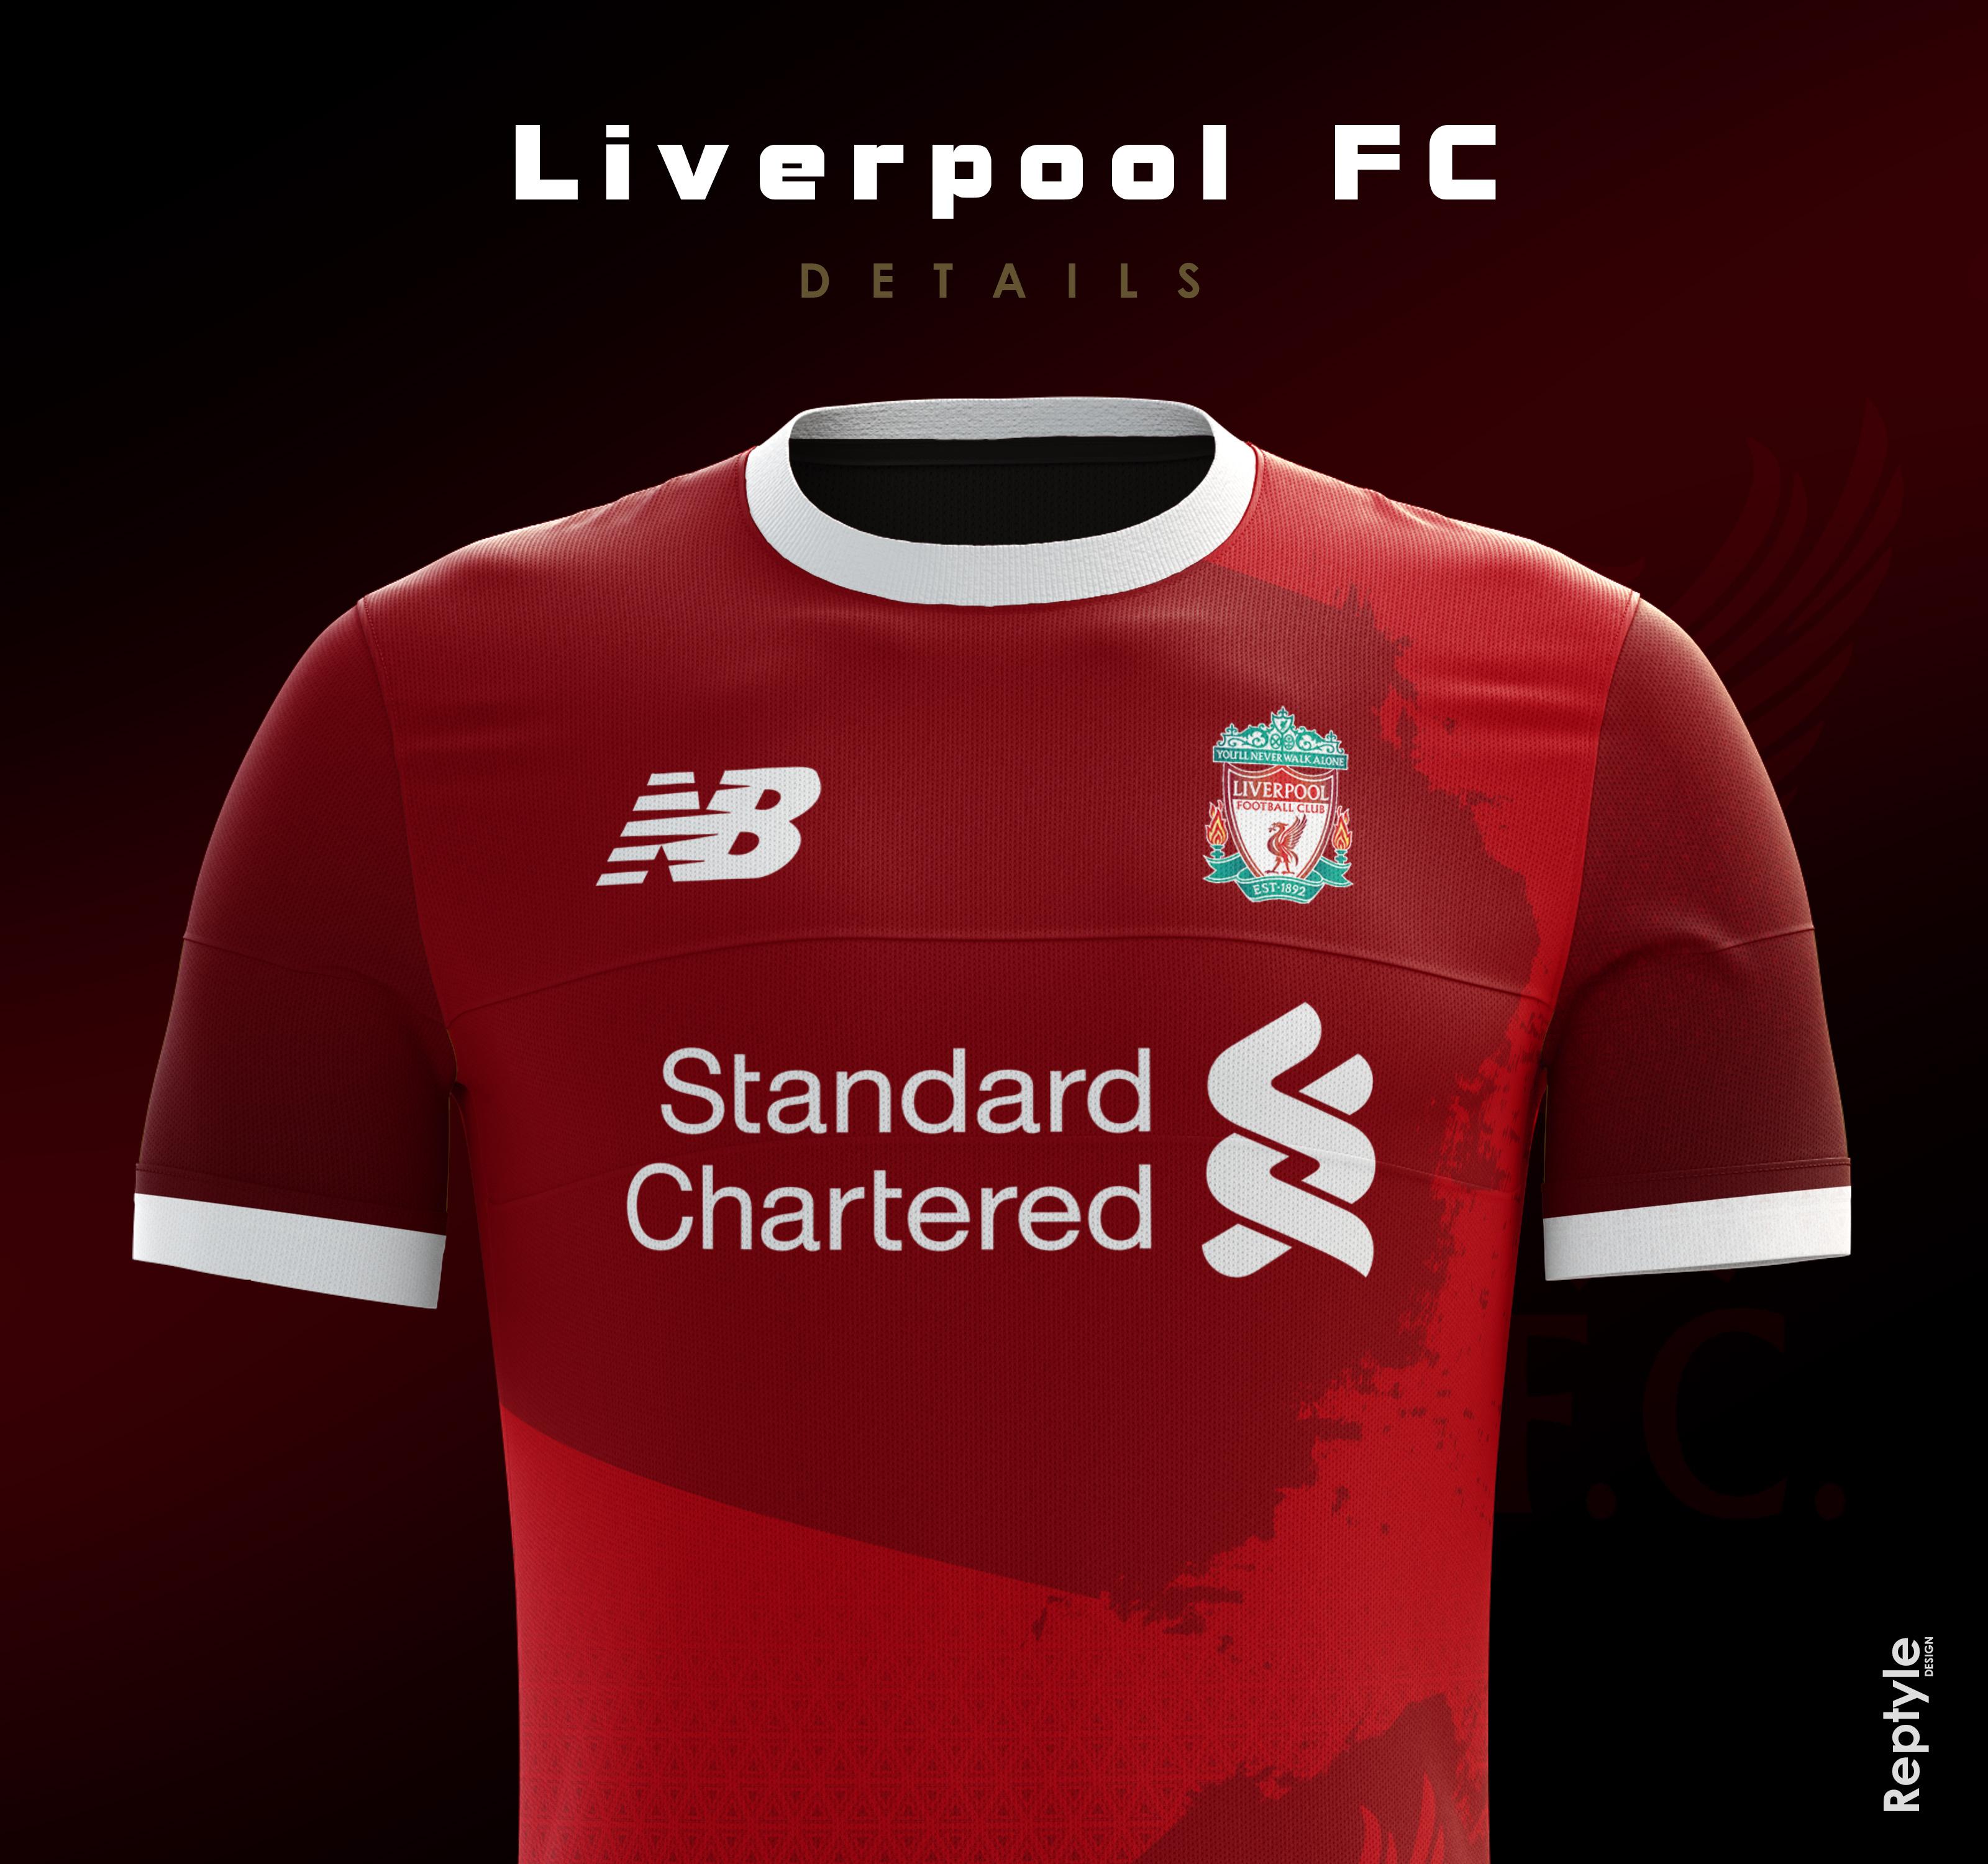 huge selection of 0f6cc c870a Liverpool Soccer Club T Shirts | Azərbaycan Dillər Universiteti